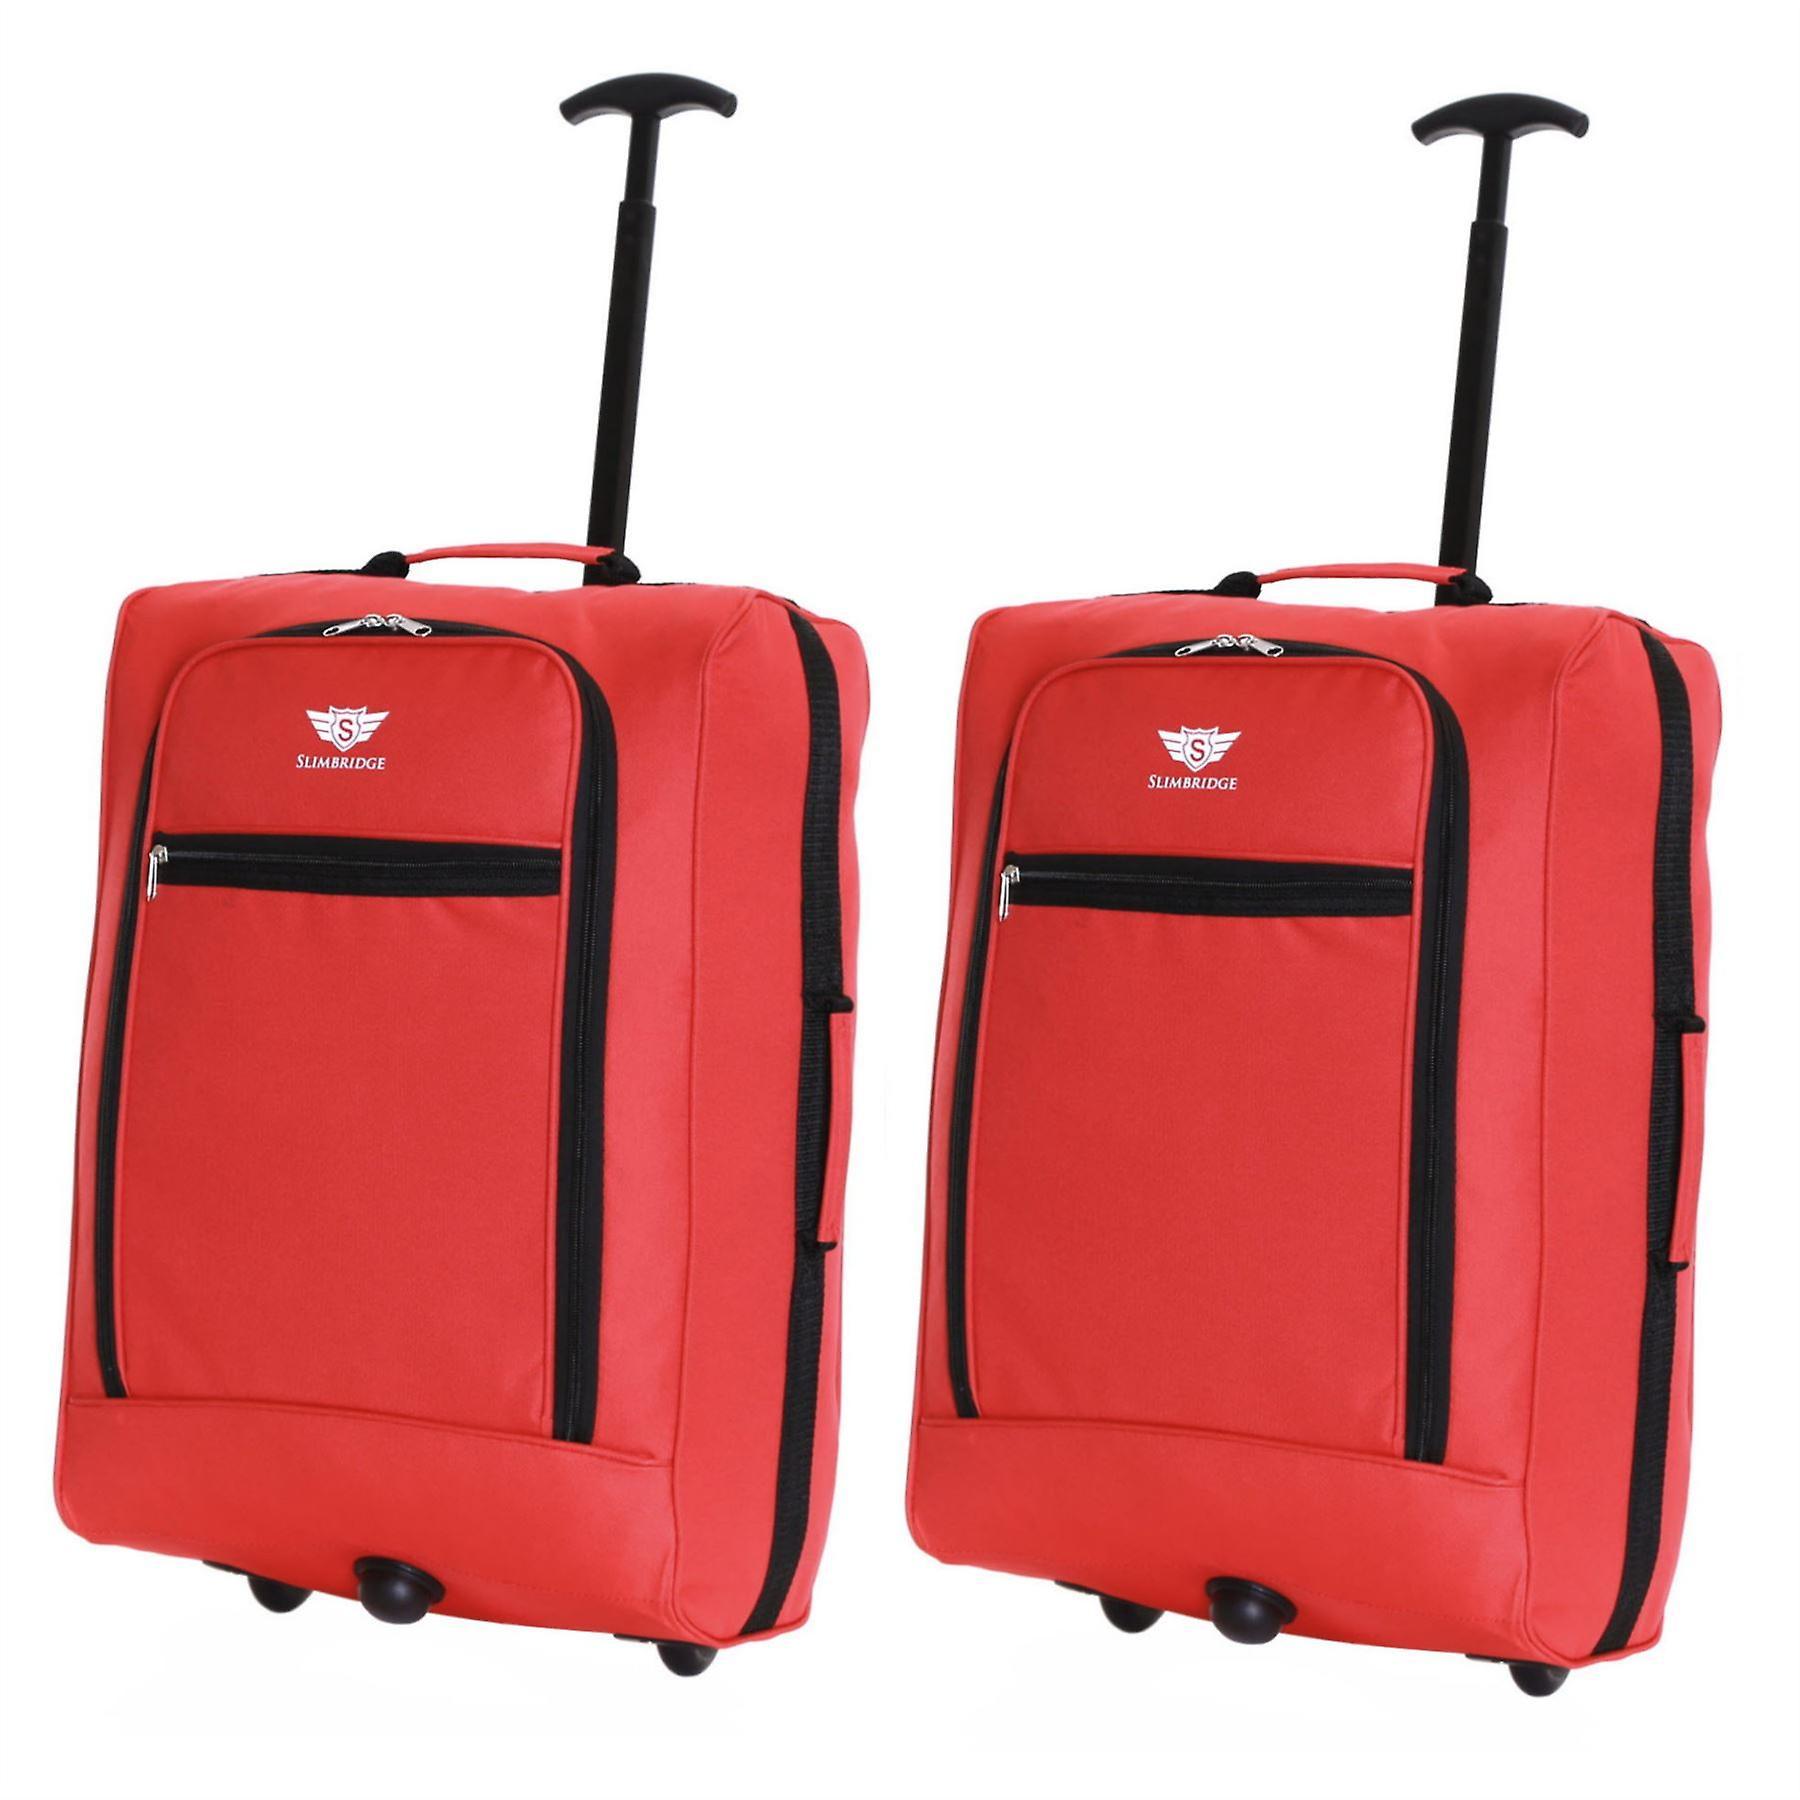 Slimbridge Montecorto Set of 2 Cabin Luggage Bags, Red (SET OF 2)